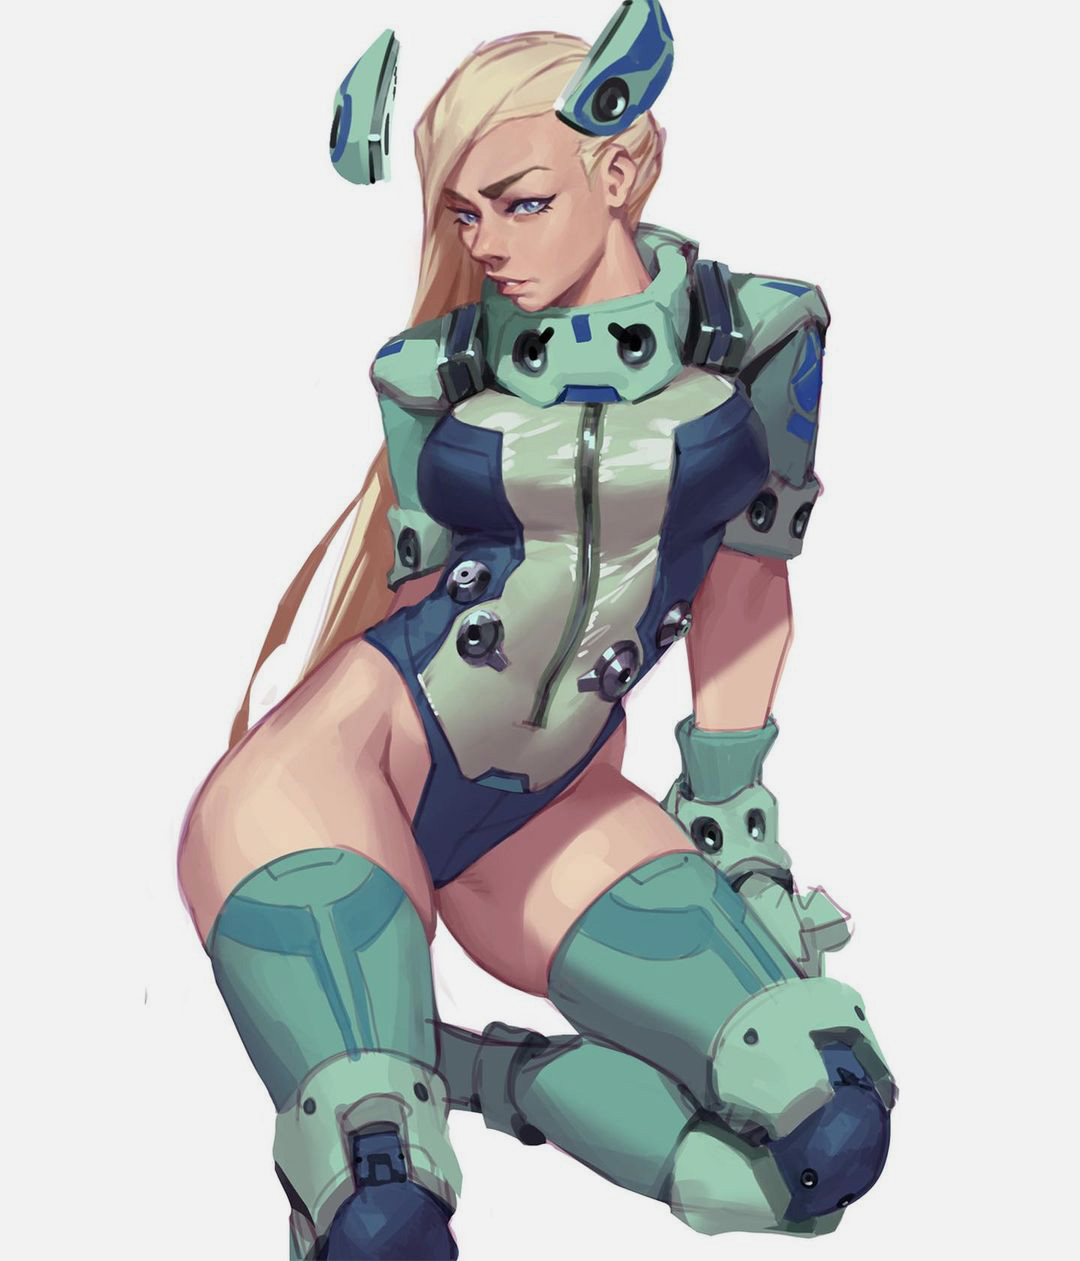 Cybergirlz